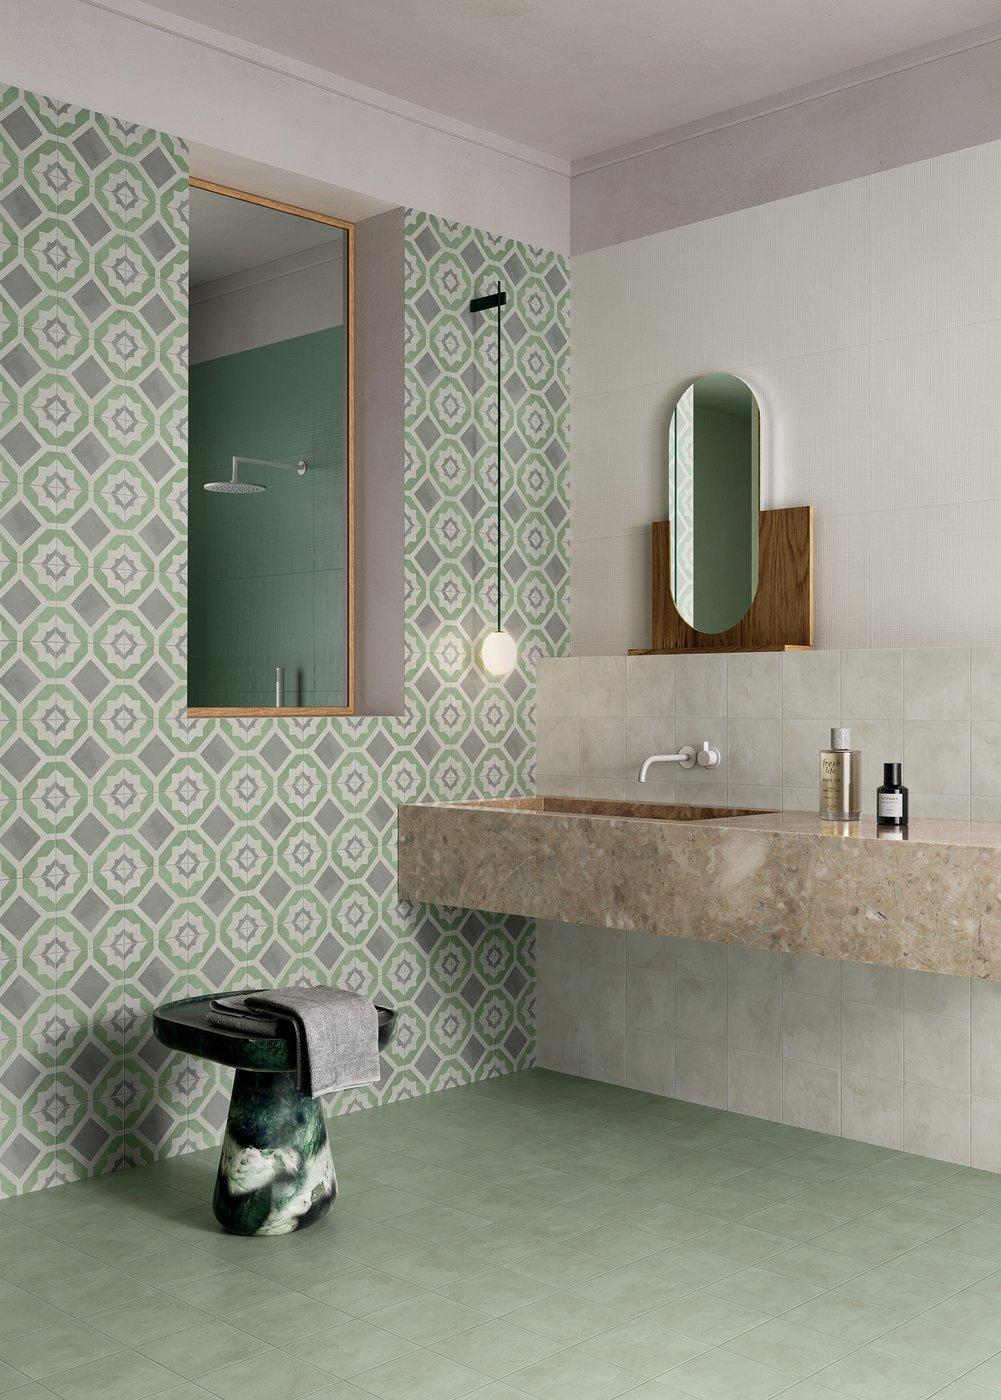 Zelená v kúpeľni - Obrázok č. 5